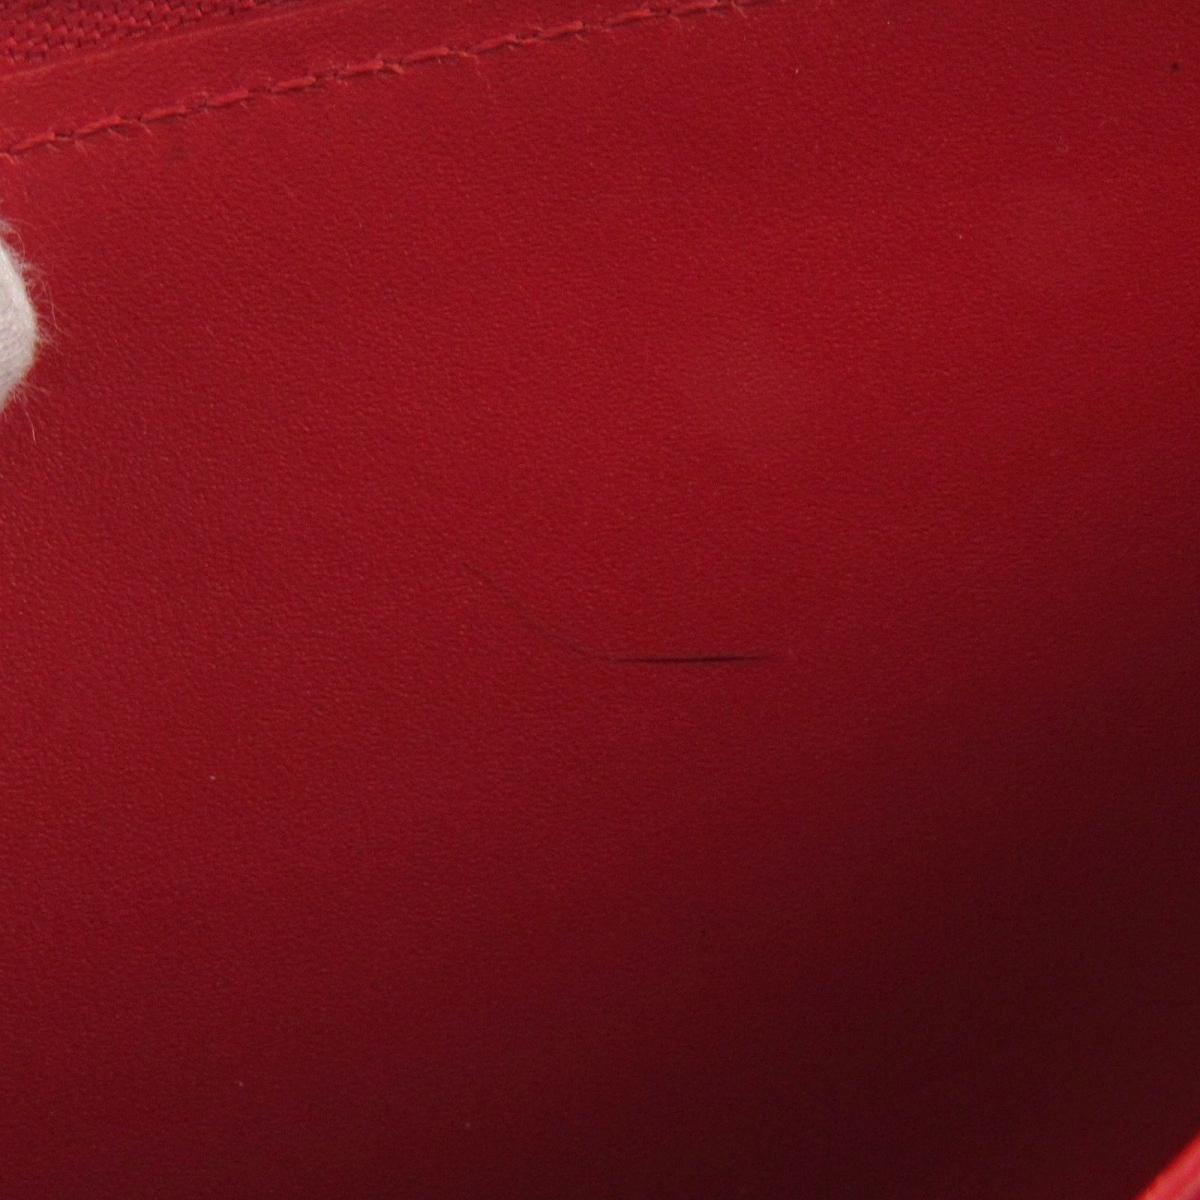 premium selection 79fdc 3b633 Louis Vuitton Red Authentic Zippy Wallet Round Purse M90417 Verni Used  Vintage